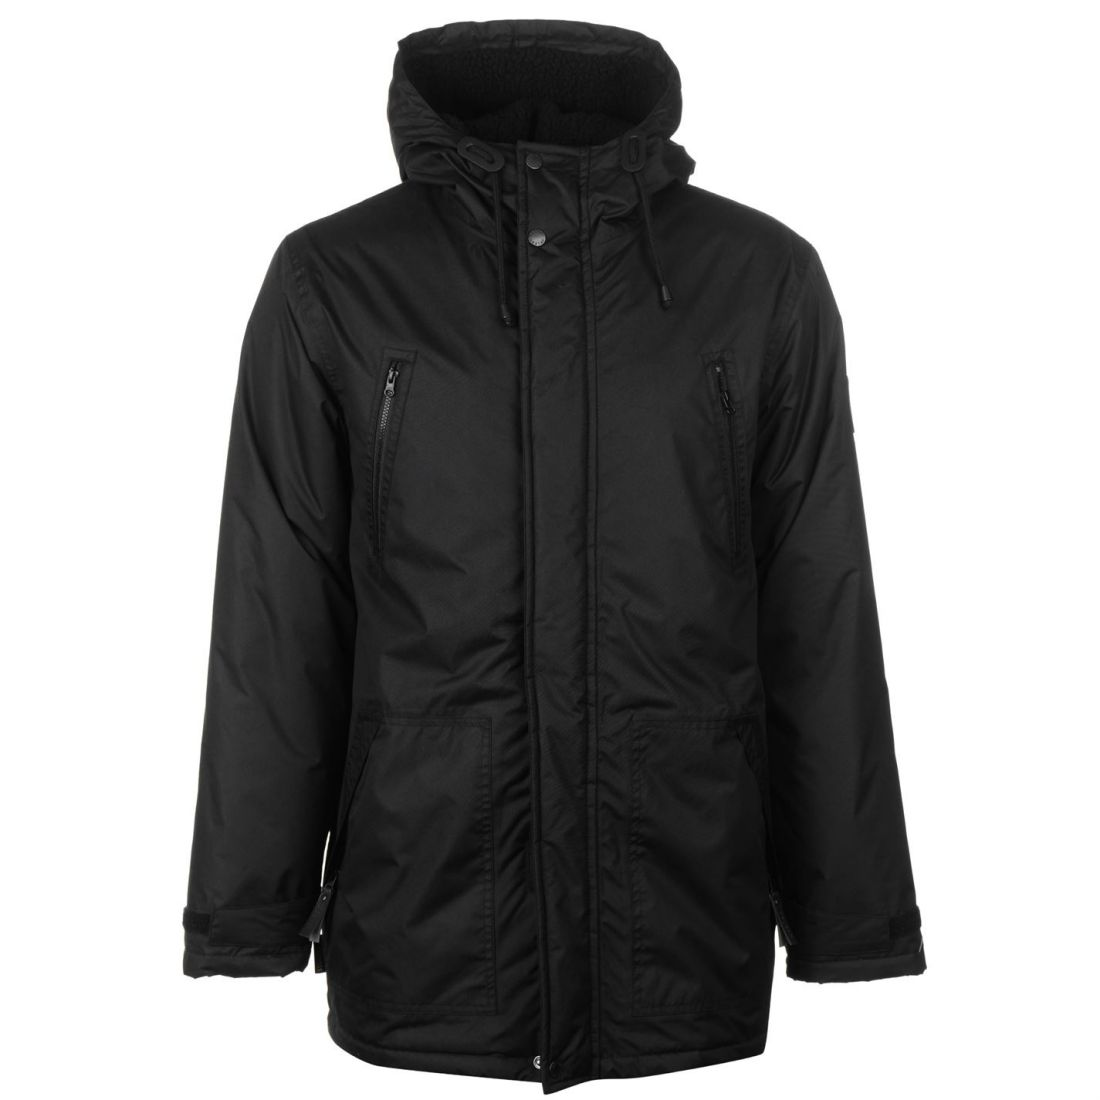 Details about Gelert Mens Highland Parka Jacket Coat Top Long Sleeve  Waterproof Breathable 0da92f73d2